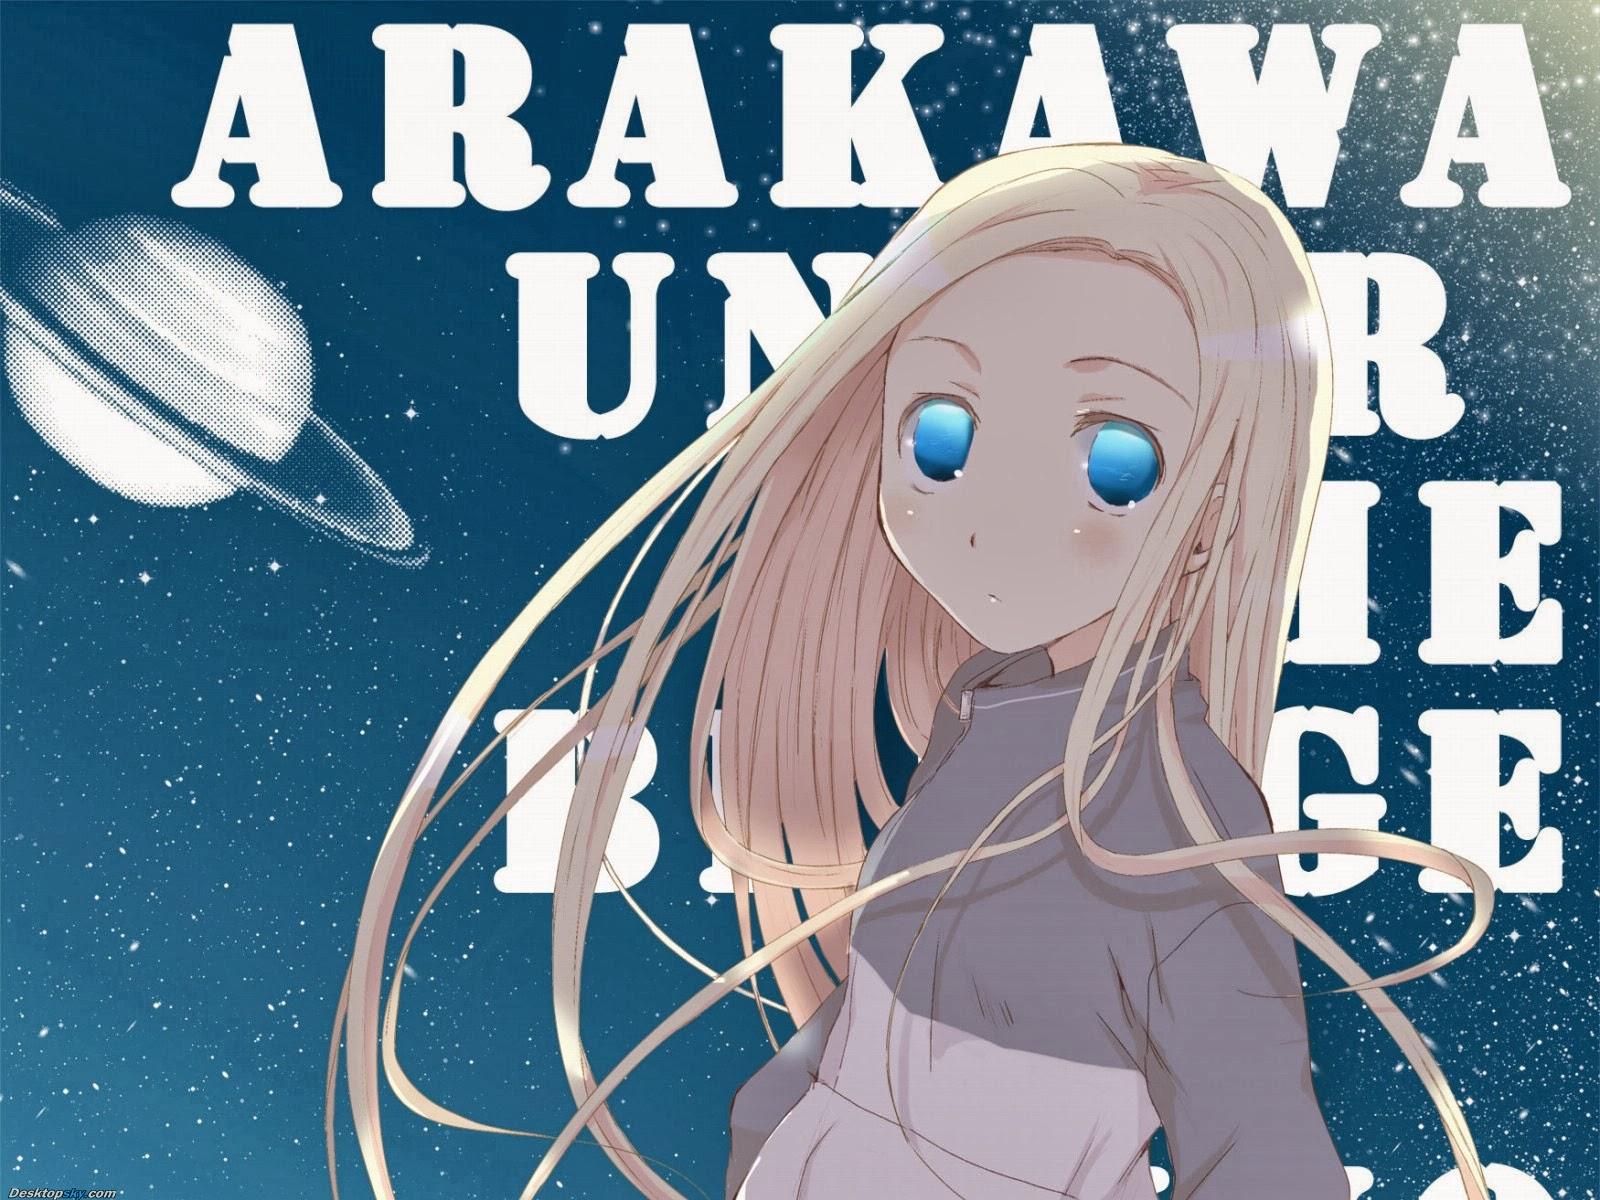 C D 荒川爆笑團 荒川アンダー ザ ブリッジ Arakawa Under The